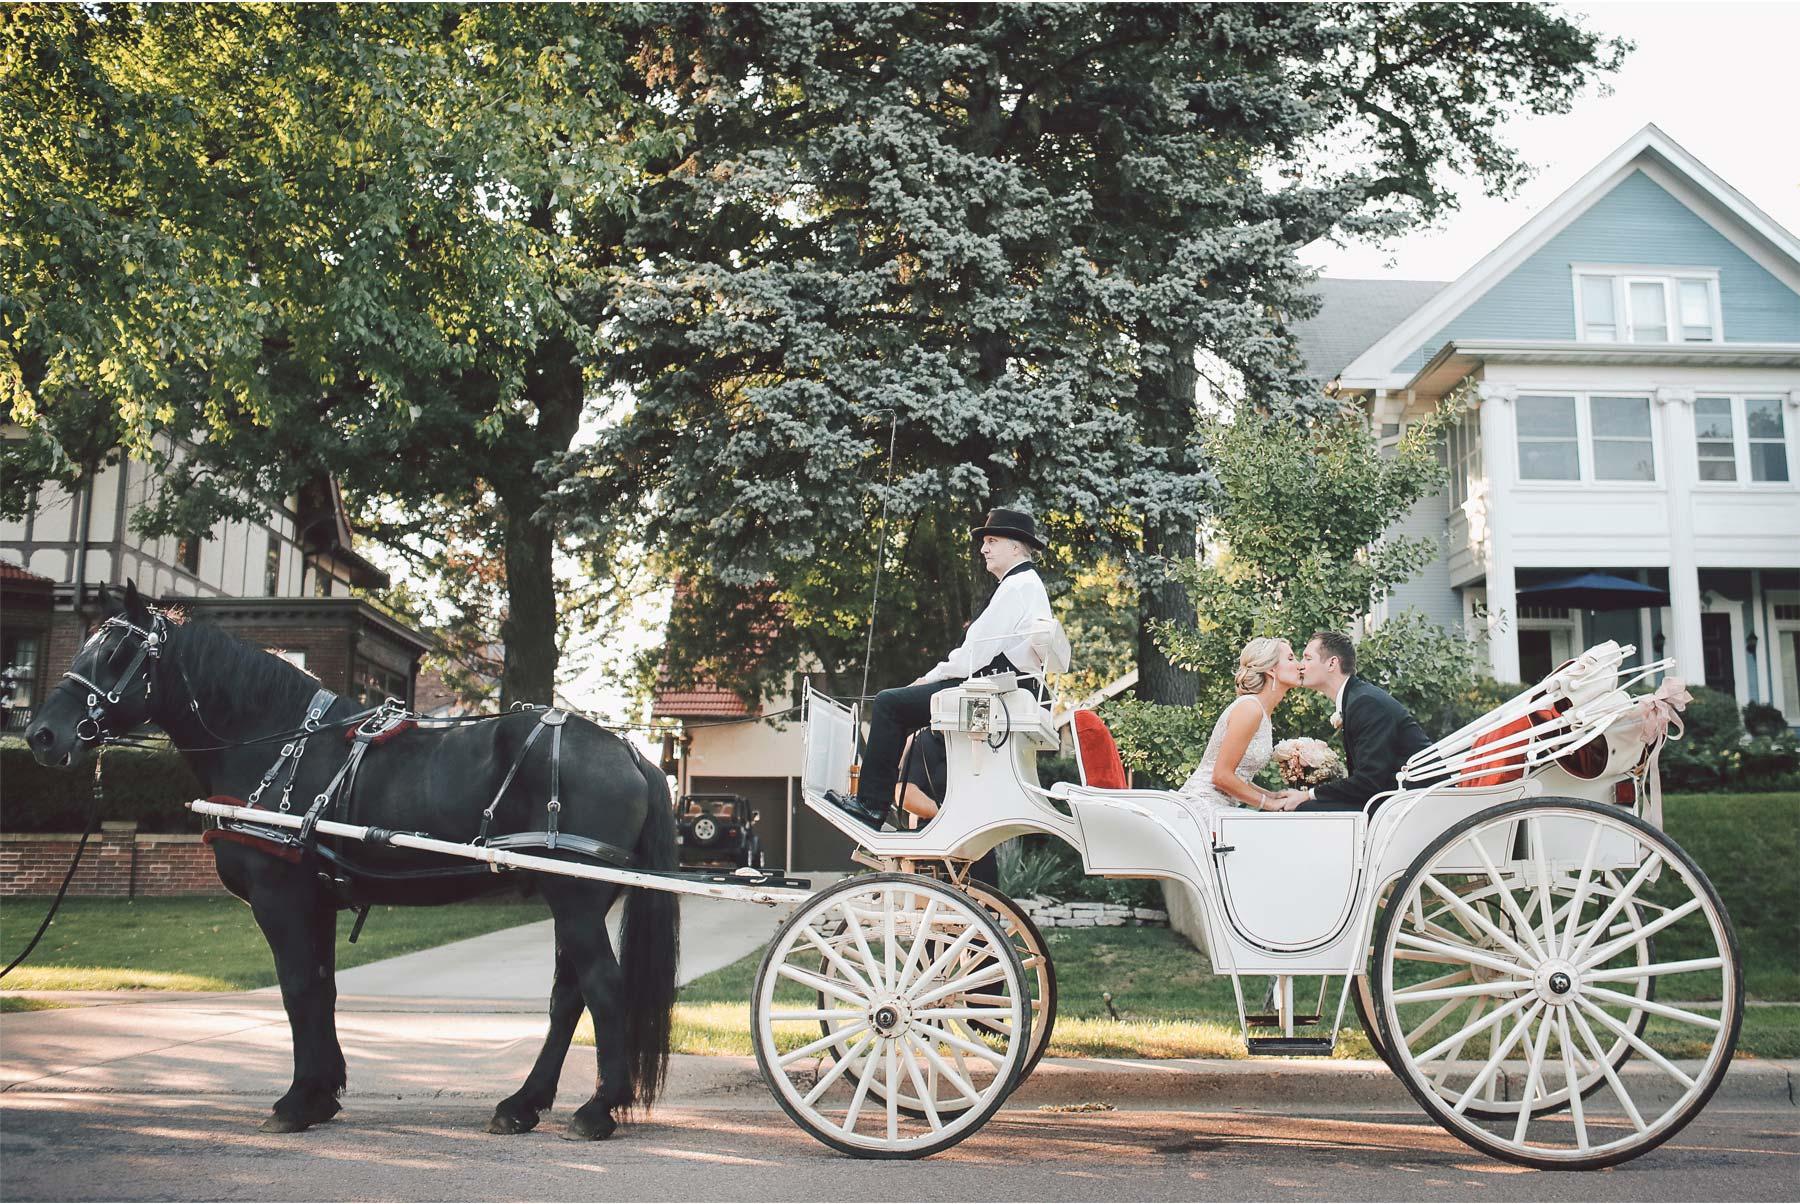 15-Minneapolis-Minnesota-Wedding-Photography-by-Vick-Photography-Ceremony-Lake-of-the-Isles-Lutheran-Church-Horse-Carraige-Send-Off-Jenna-and-Josh.jpg